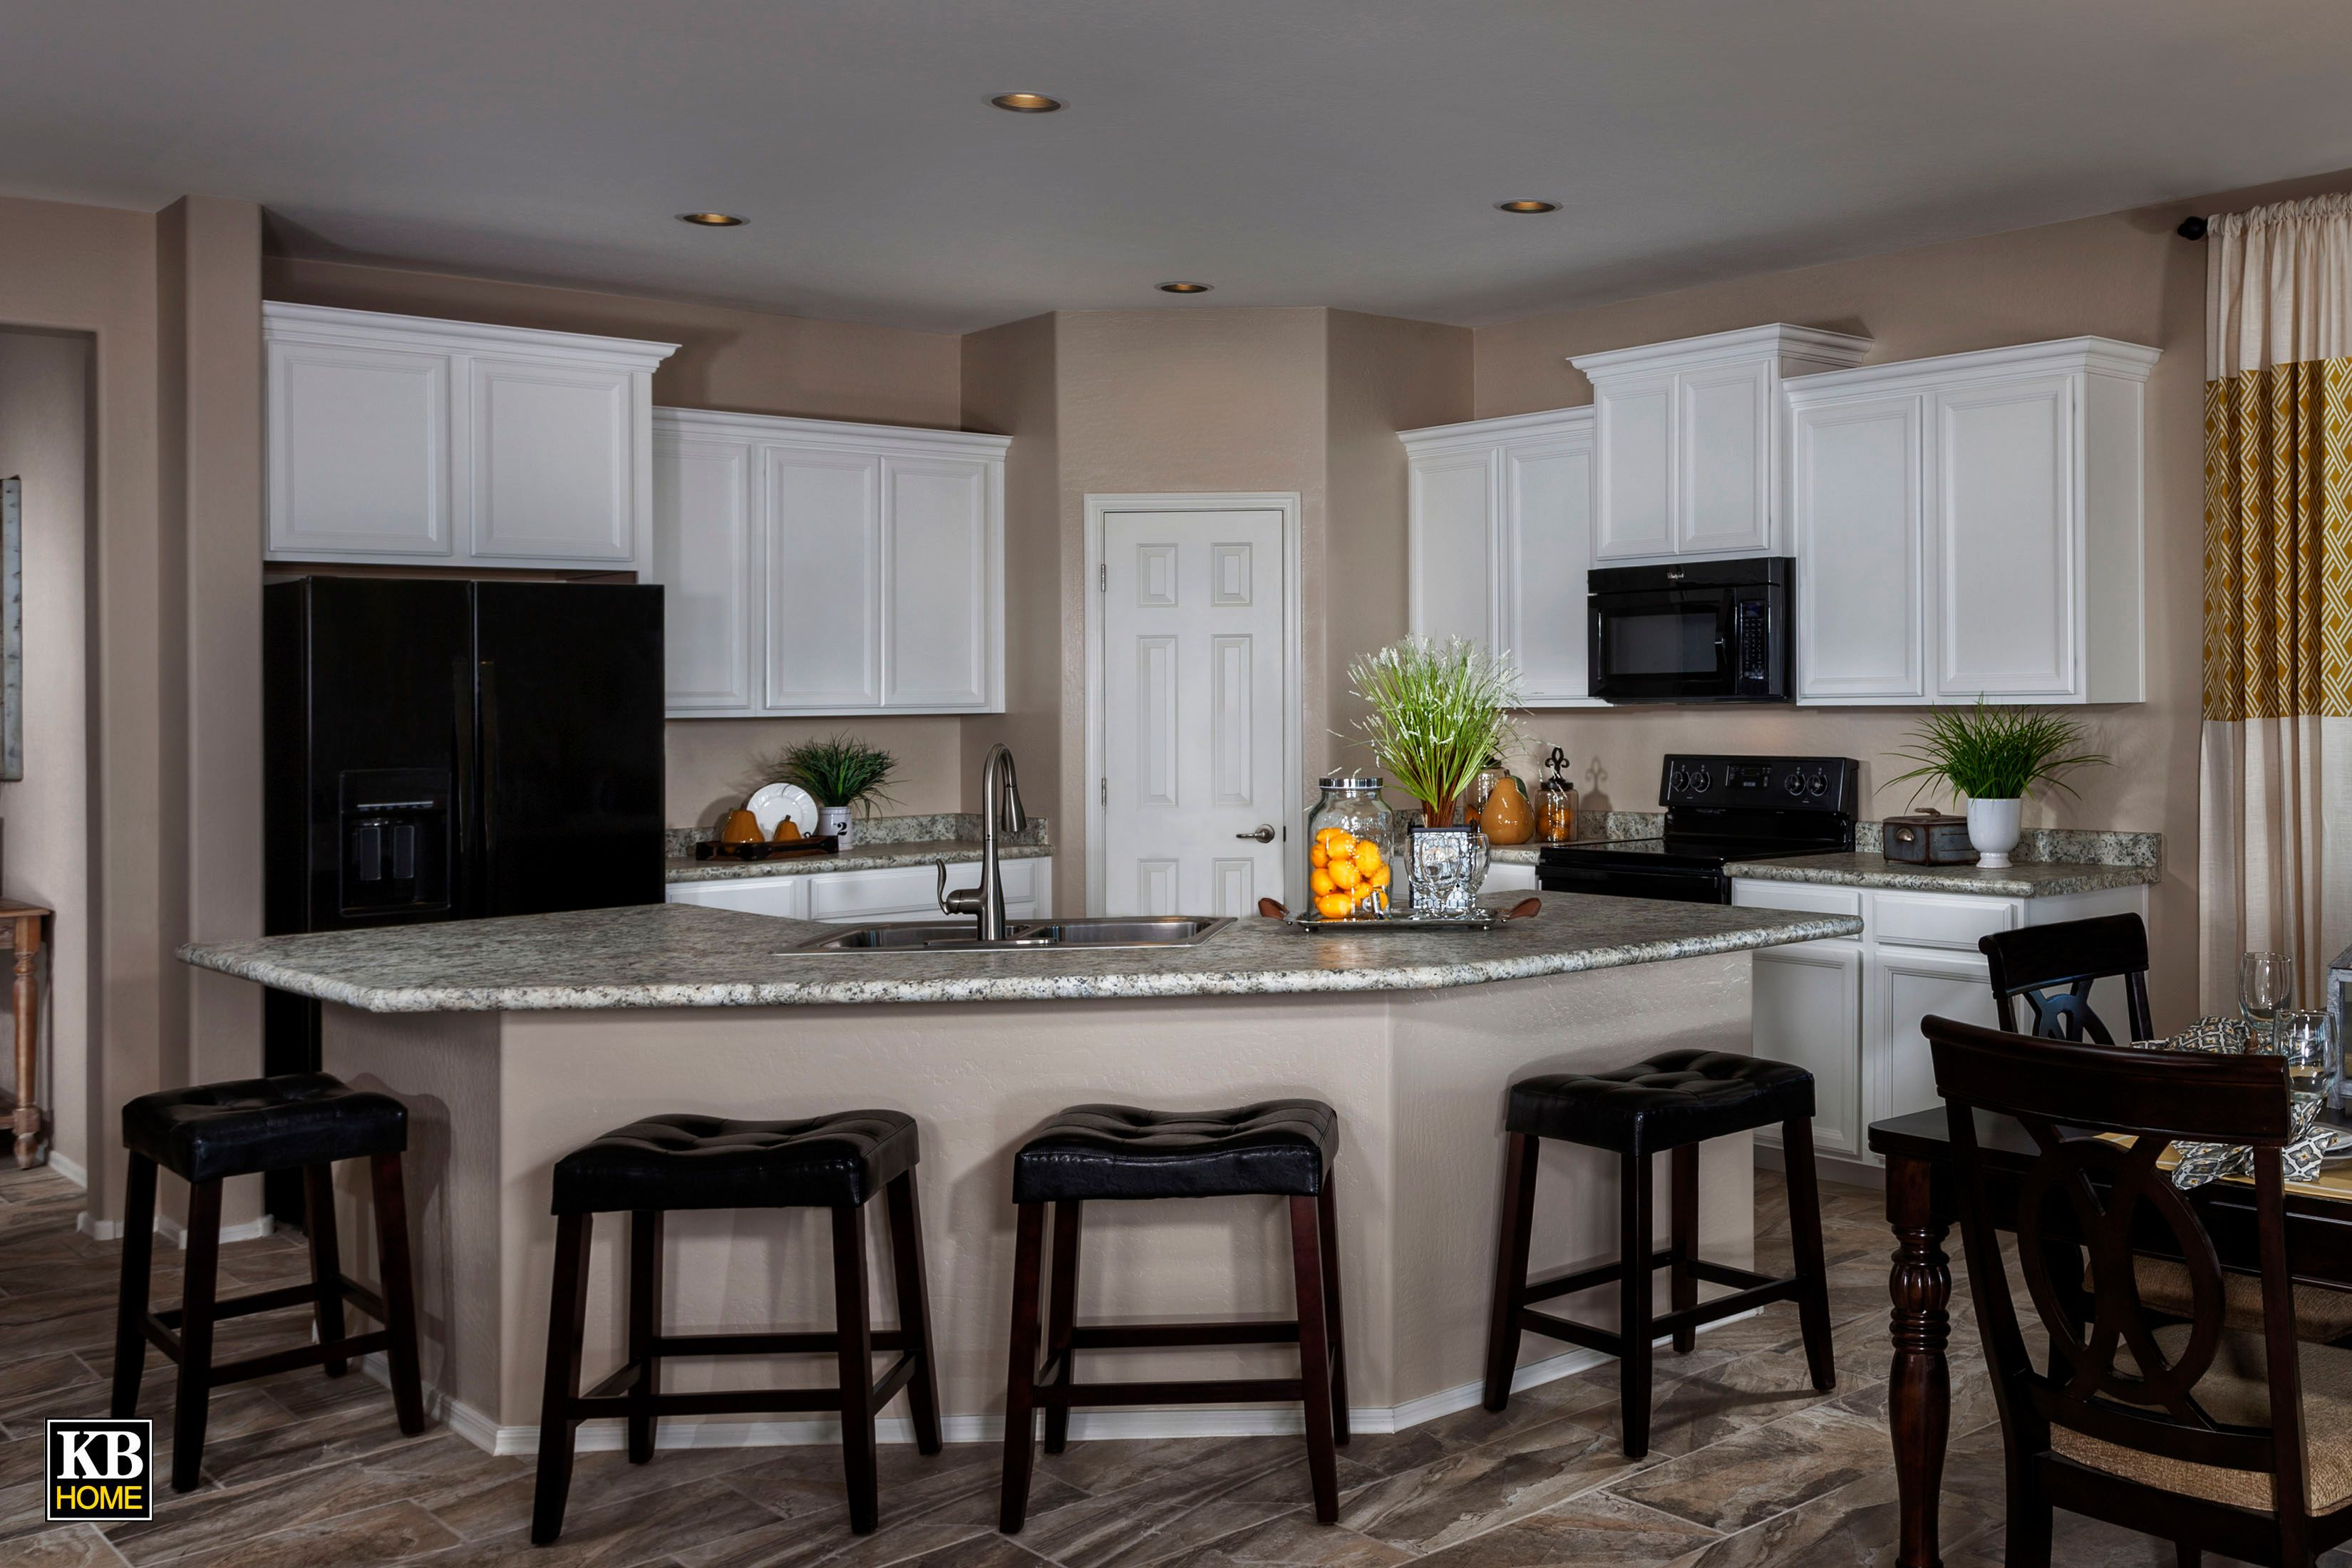 Sin Lomas Model Kitchen Plan 2130 #kbhome #arizona #interiordesign Enchanting New Model Kitchen Design Design Ideas